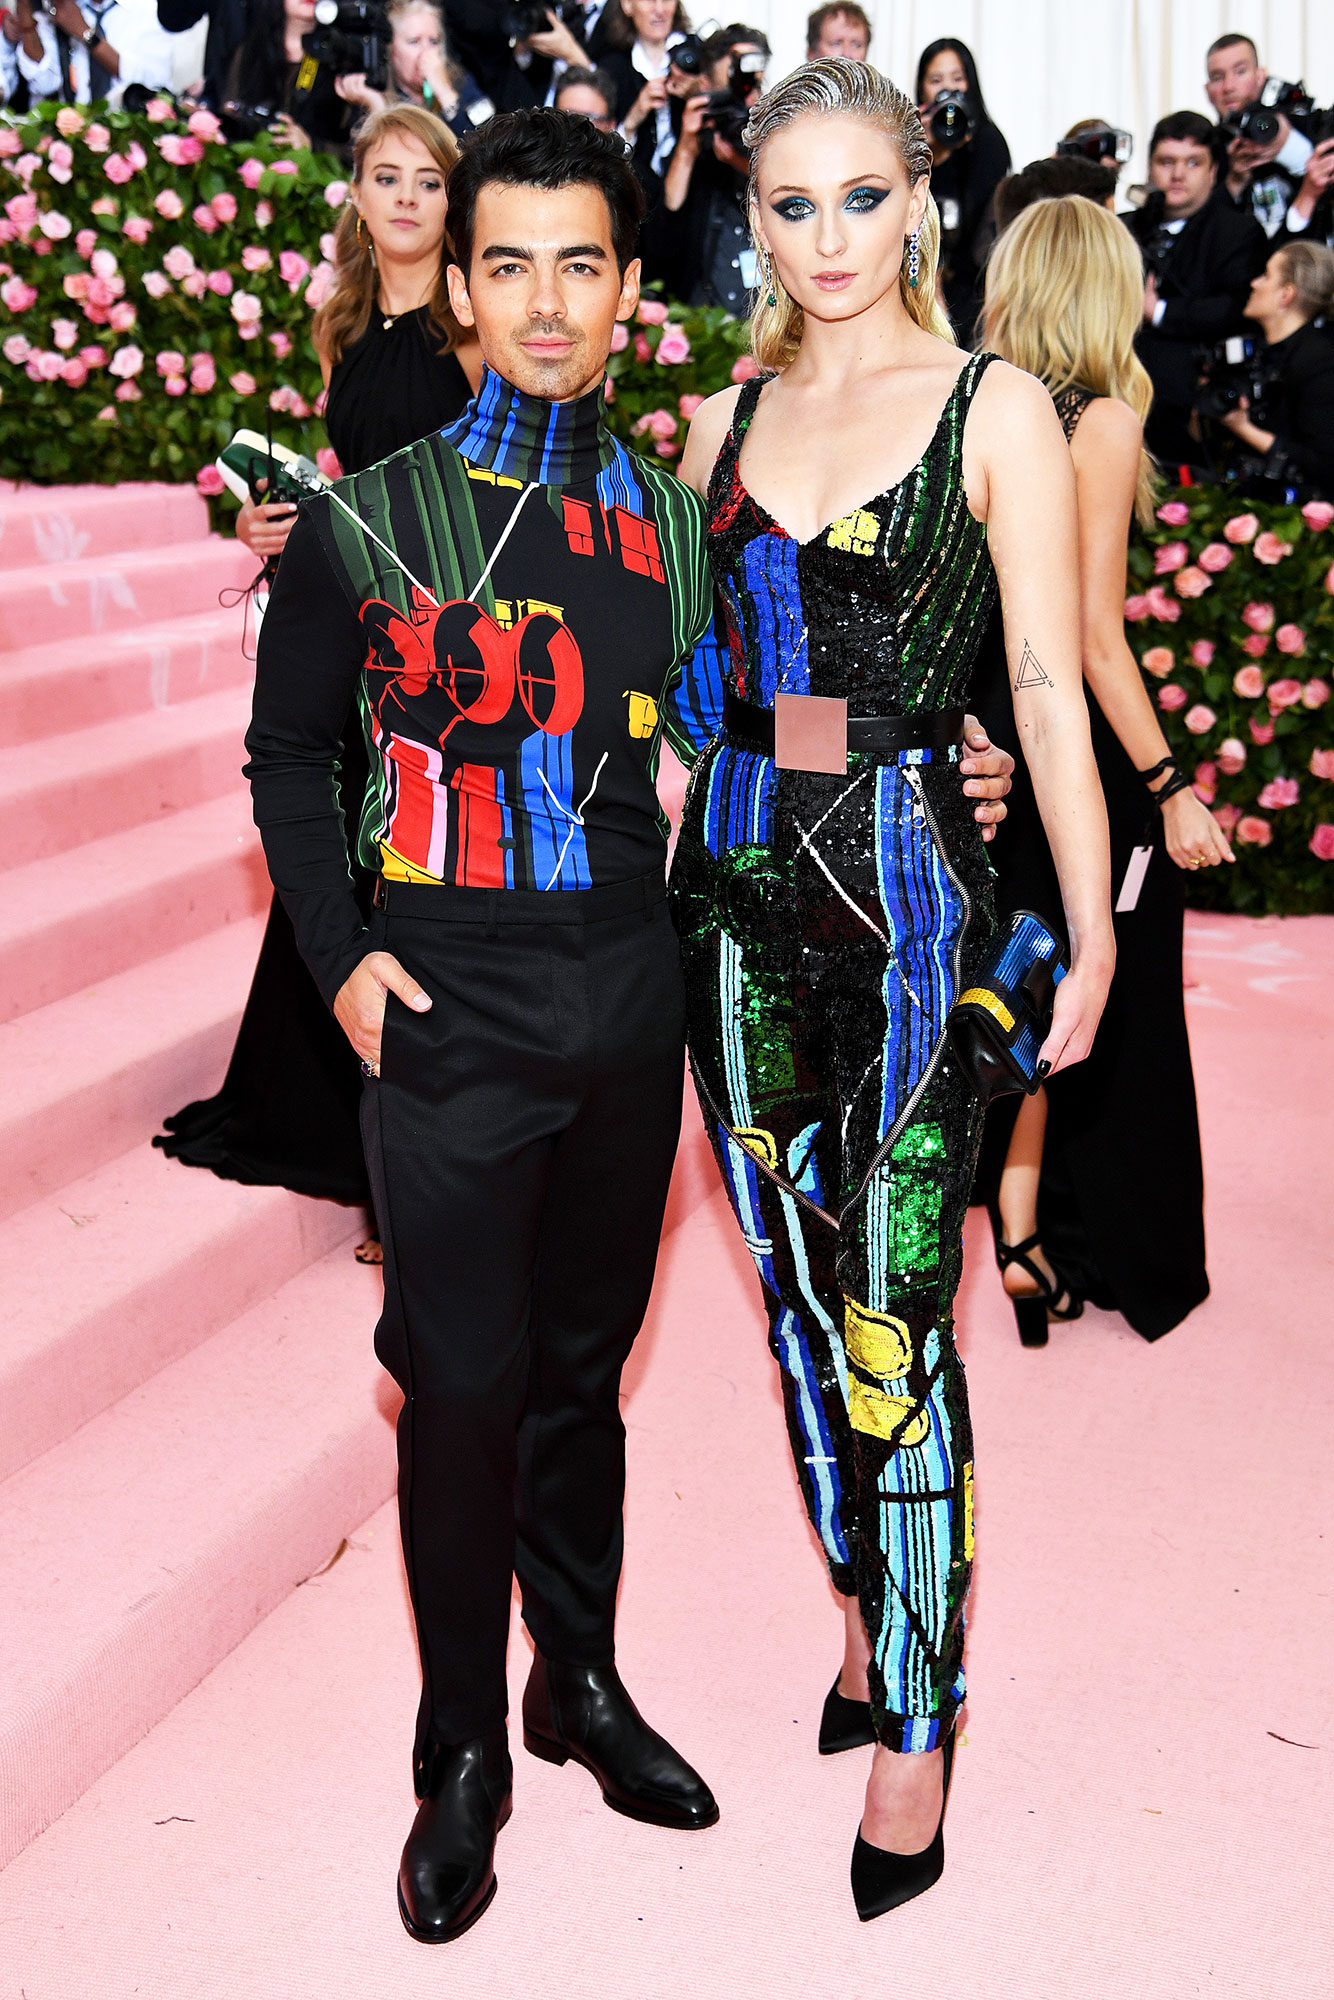 Joe Jonas and Sophie Turner met gala 2019 couples - Fresh off their surprise Las Vegas nuptials, the newlyweds matched in geometric-print Louis Vuitton looks.